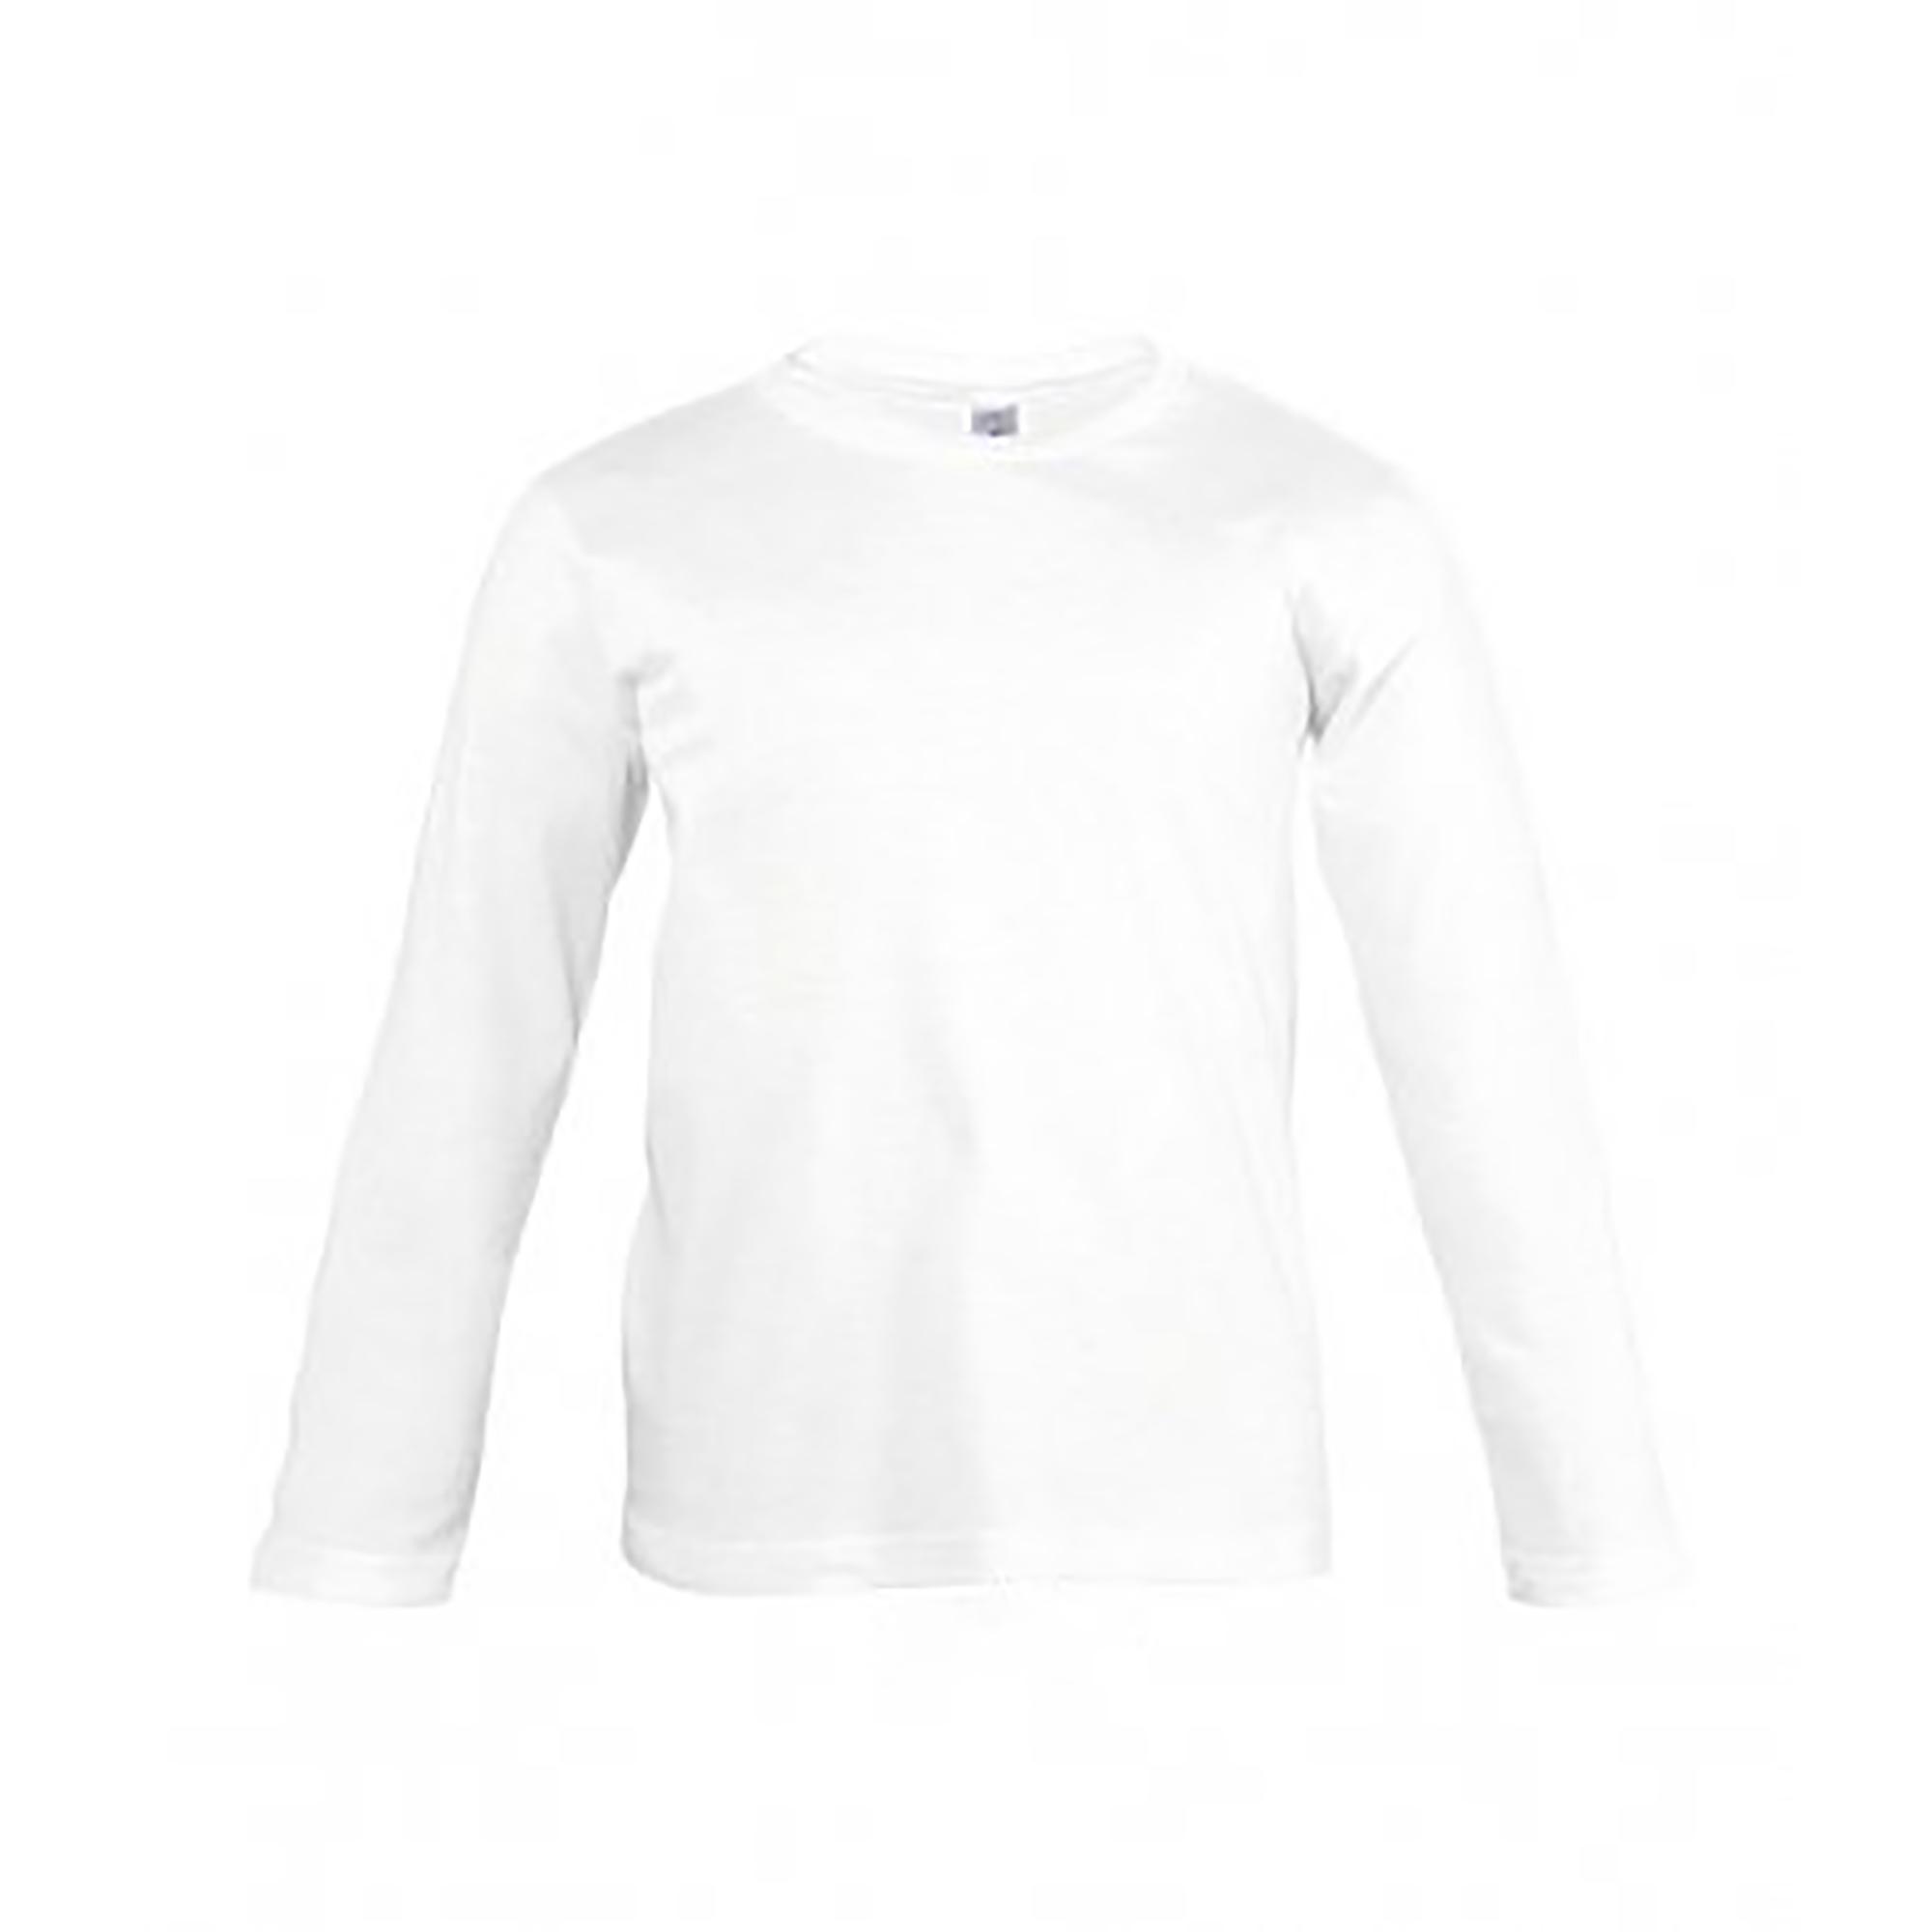 FOTL Childrens T Shirt Plain 100/% Cotton Blank Kids Tee Shirt 3-13 years